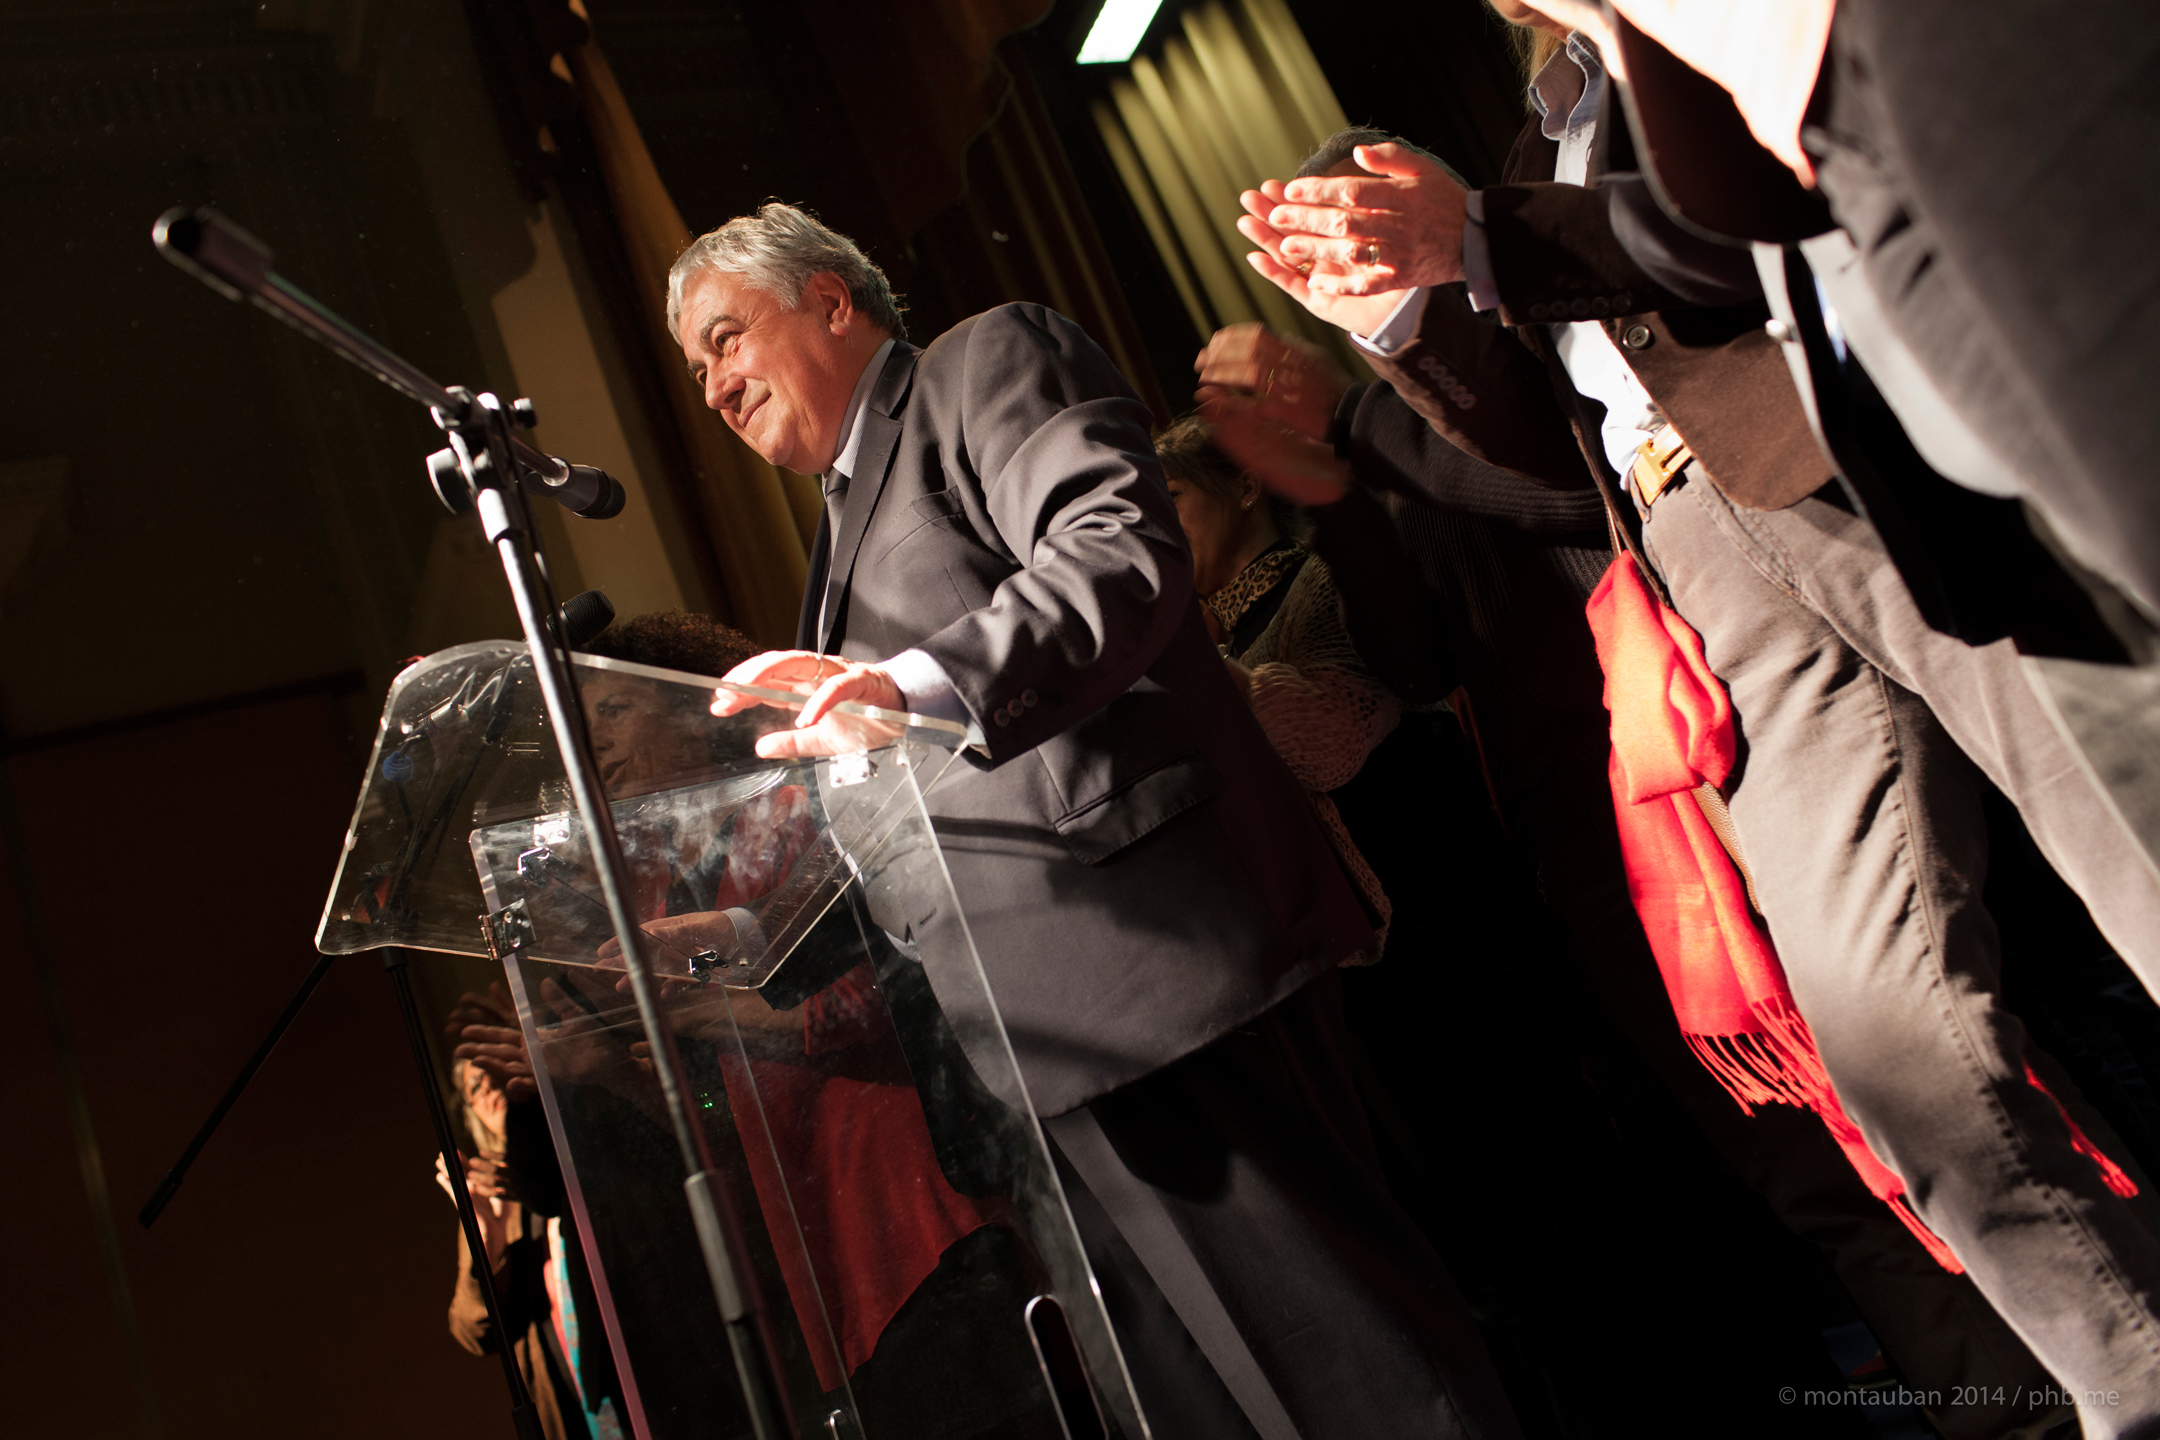 Montauban-2014-Rassemblement-peuple-gauche-vote-IMG_3381